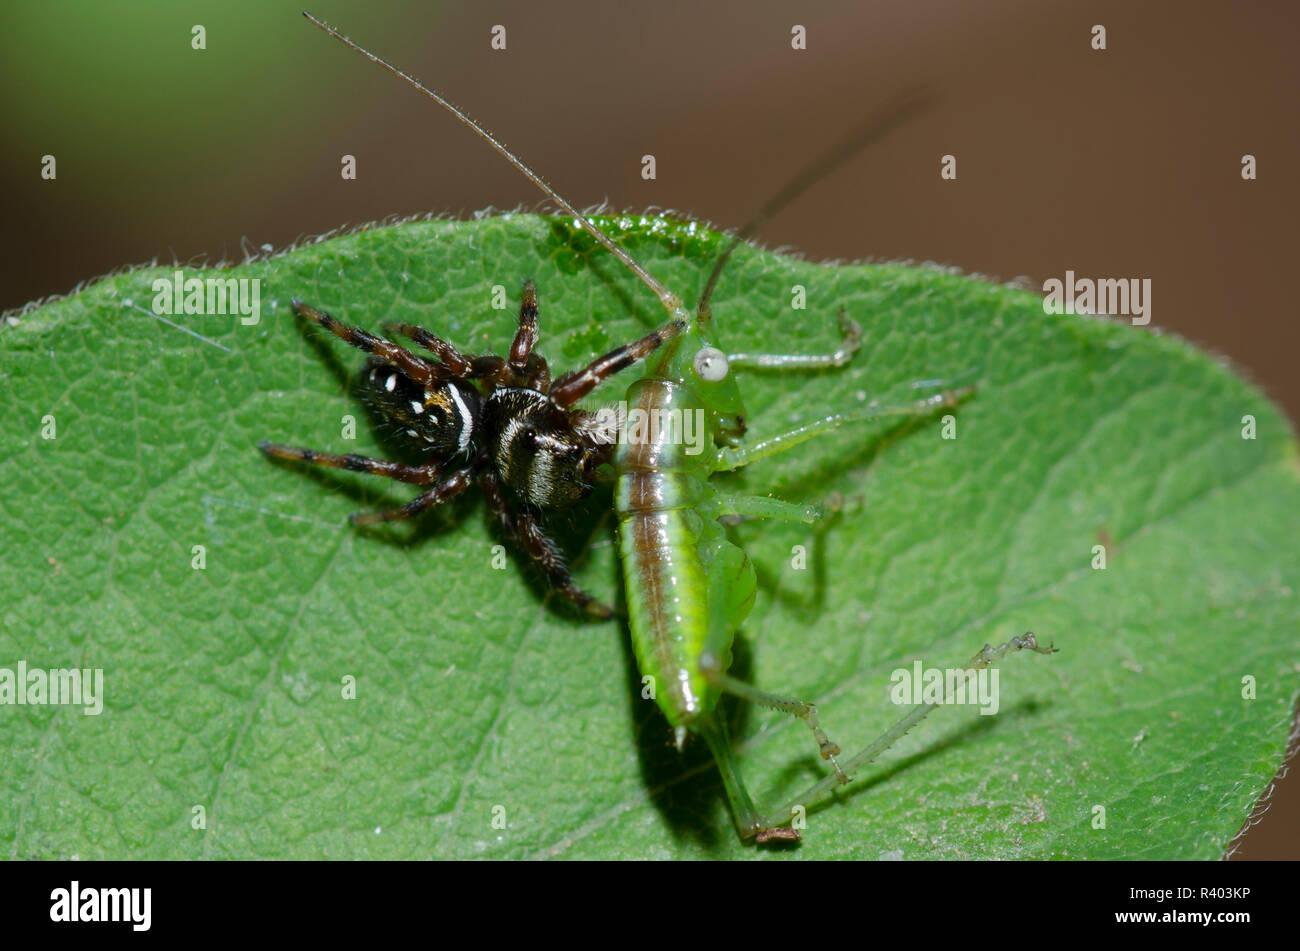 Jumping Spider, Paraphidippus aurantius, mit katydid, Familie Tettigoniidae, Nymphe Beute Stockbild